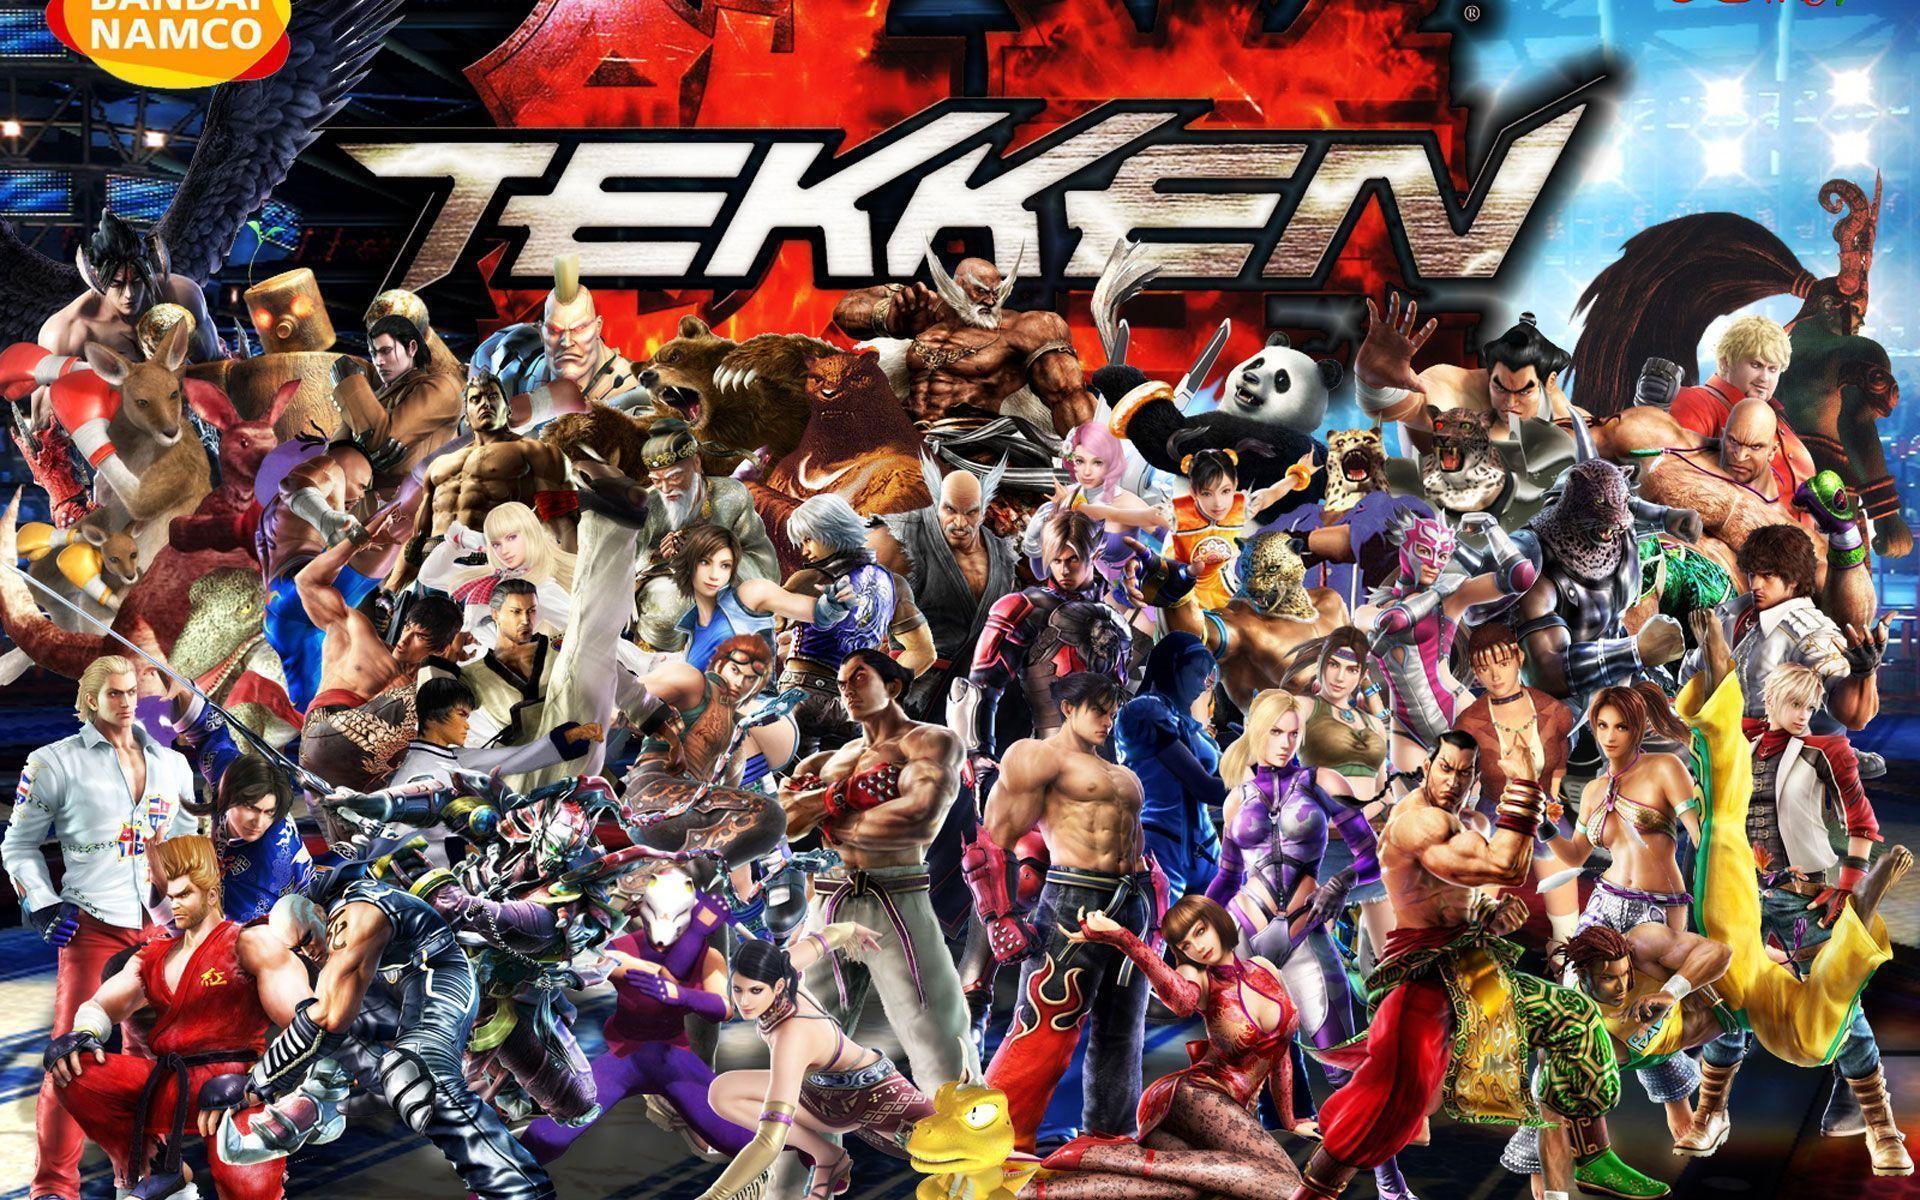 tekken 7 wallpaper hd - photo #29